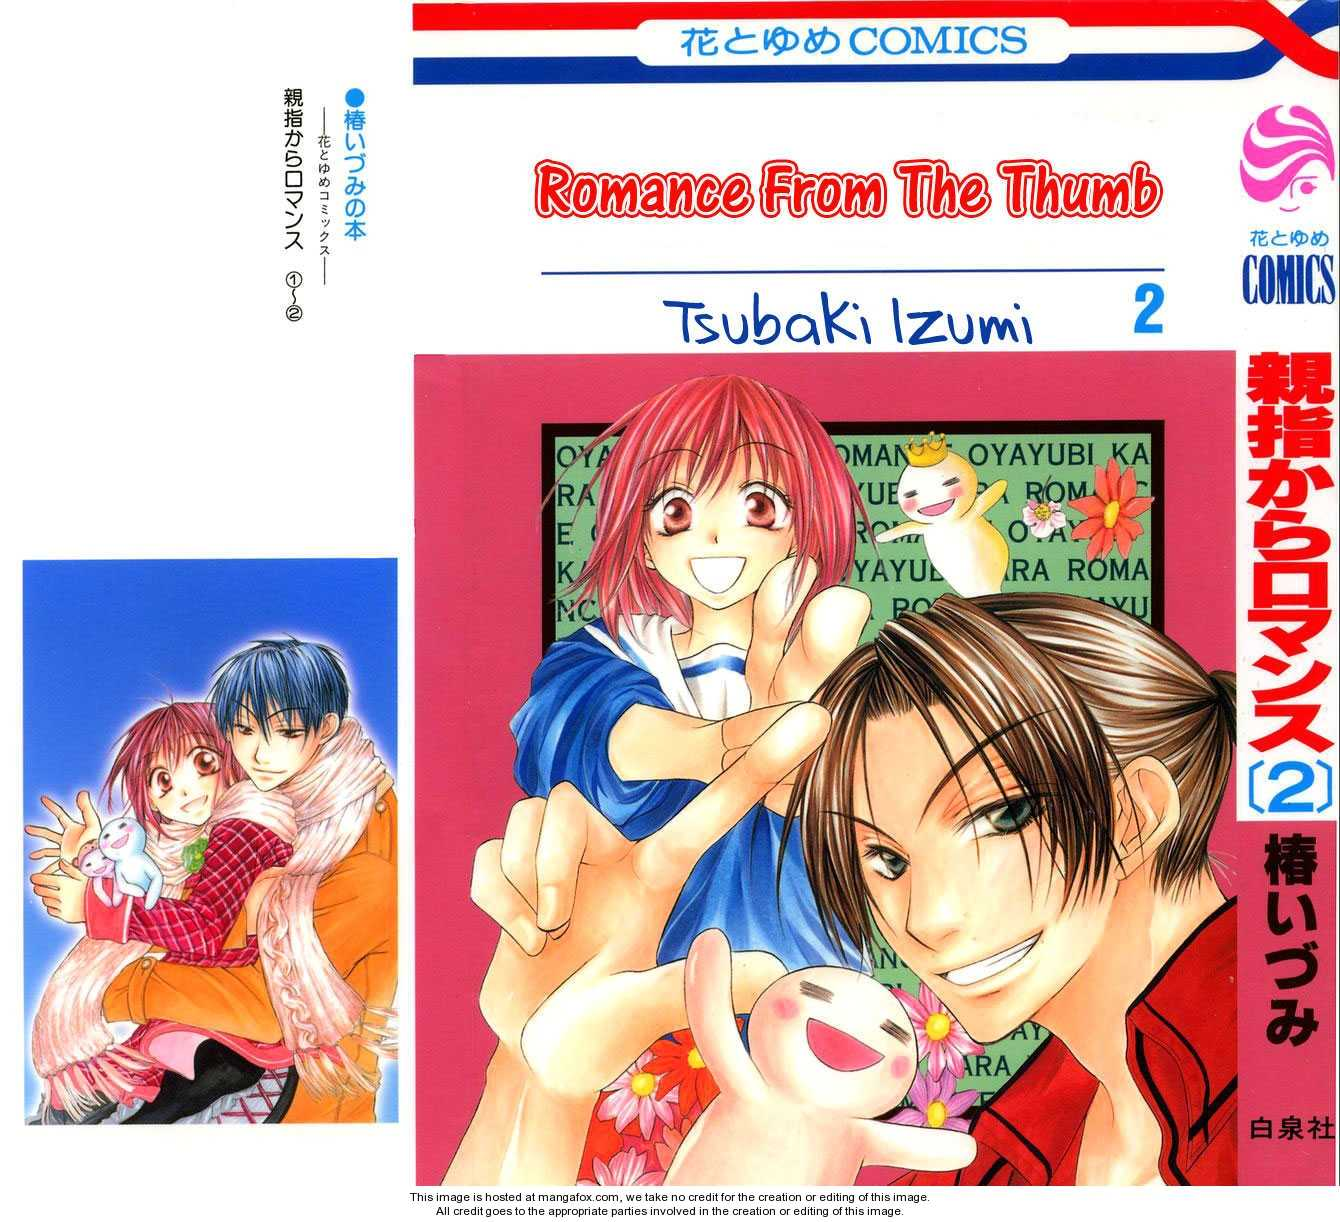 Oyayubi kara Romance 6 Page 2